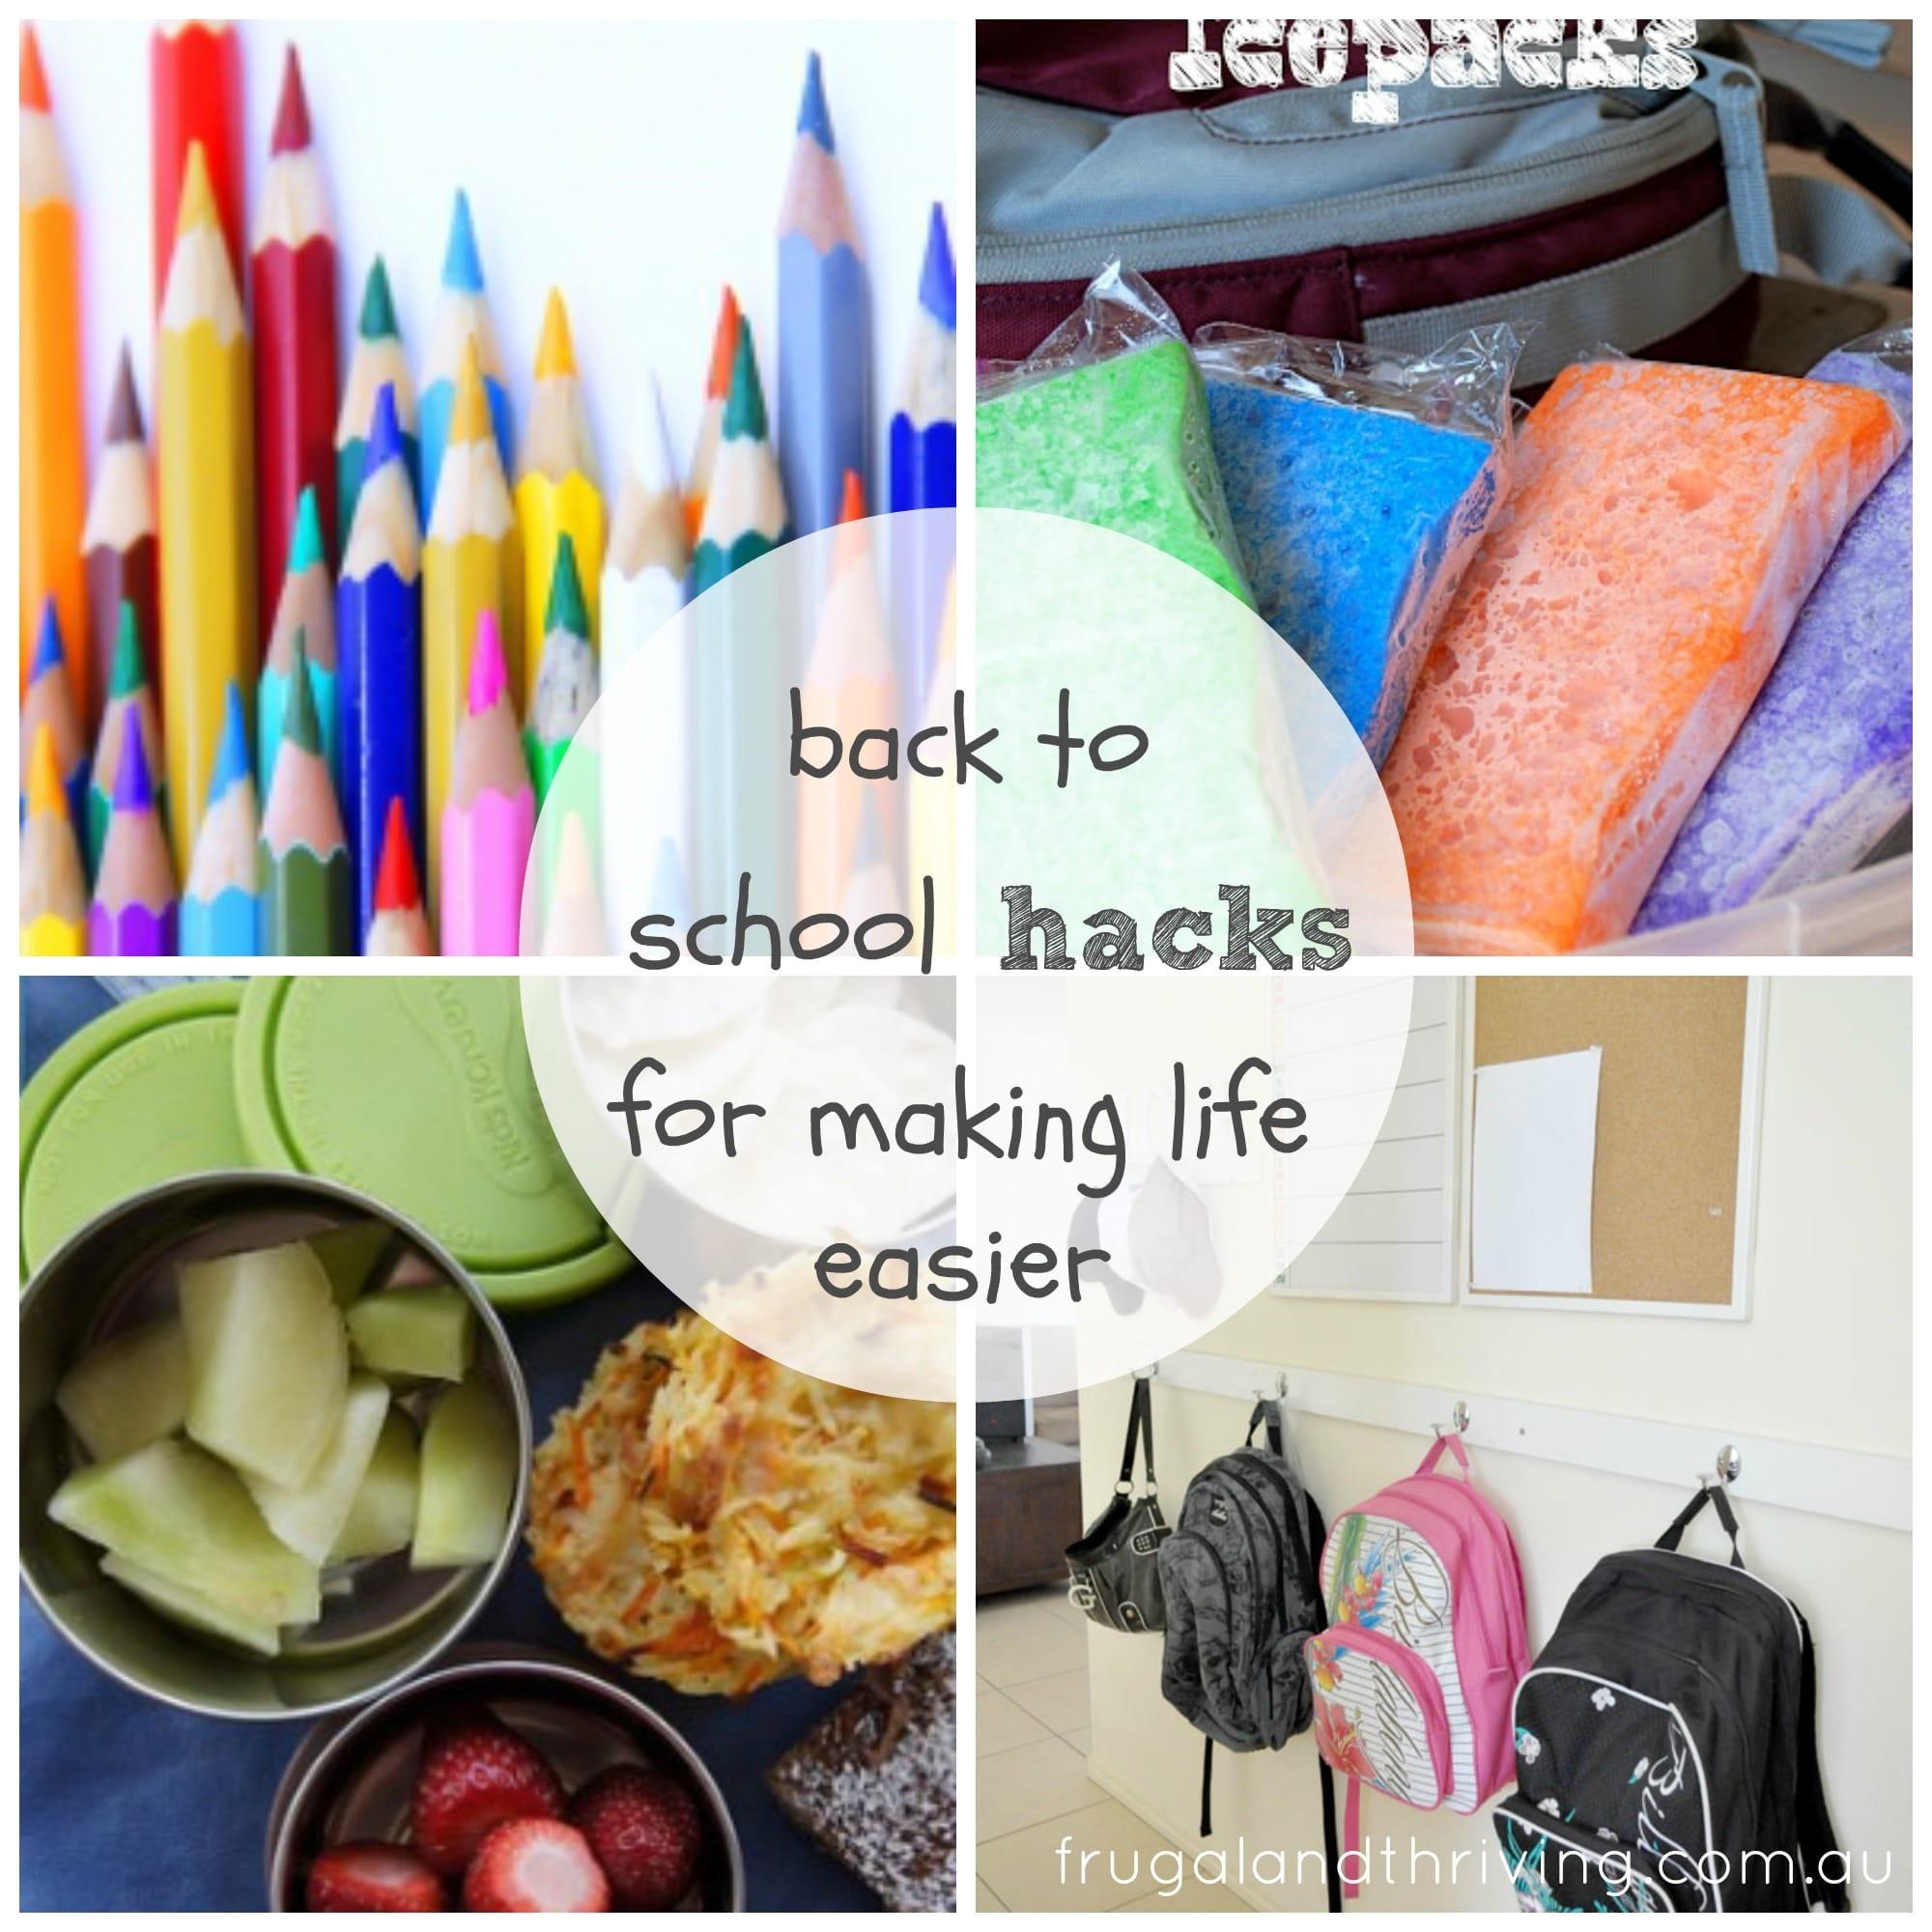 15 back to school hacks to make life easier